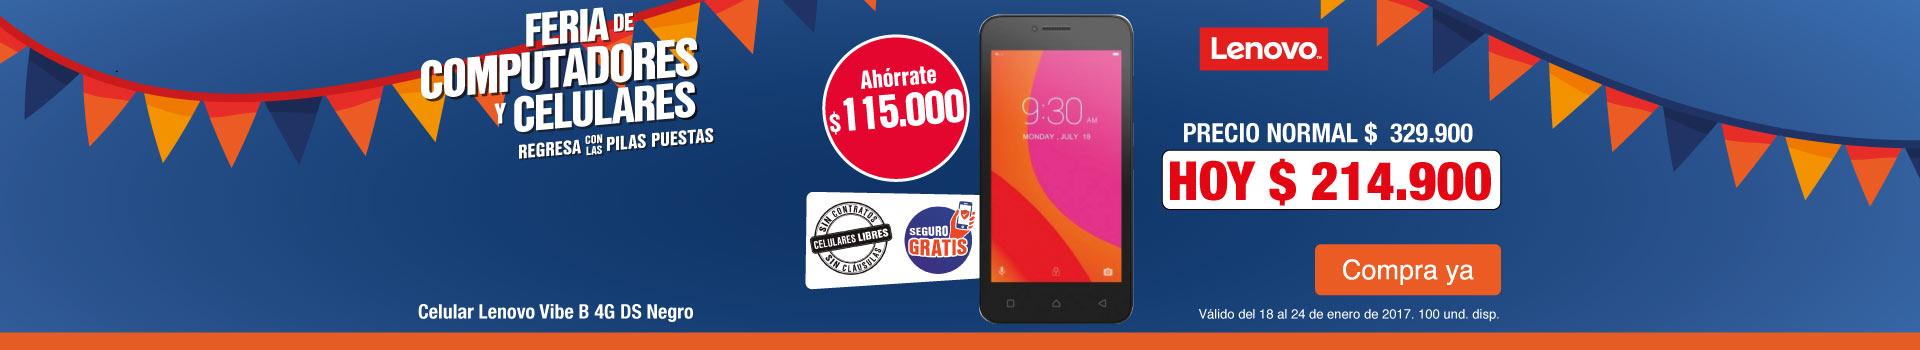 HIPER AK - Ahorra $115.000 en Celular LENOVO Vibe B - Ene24